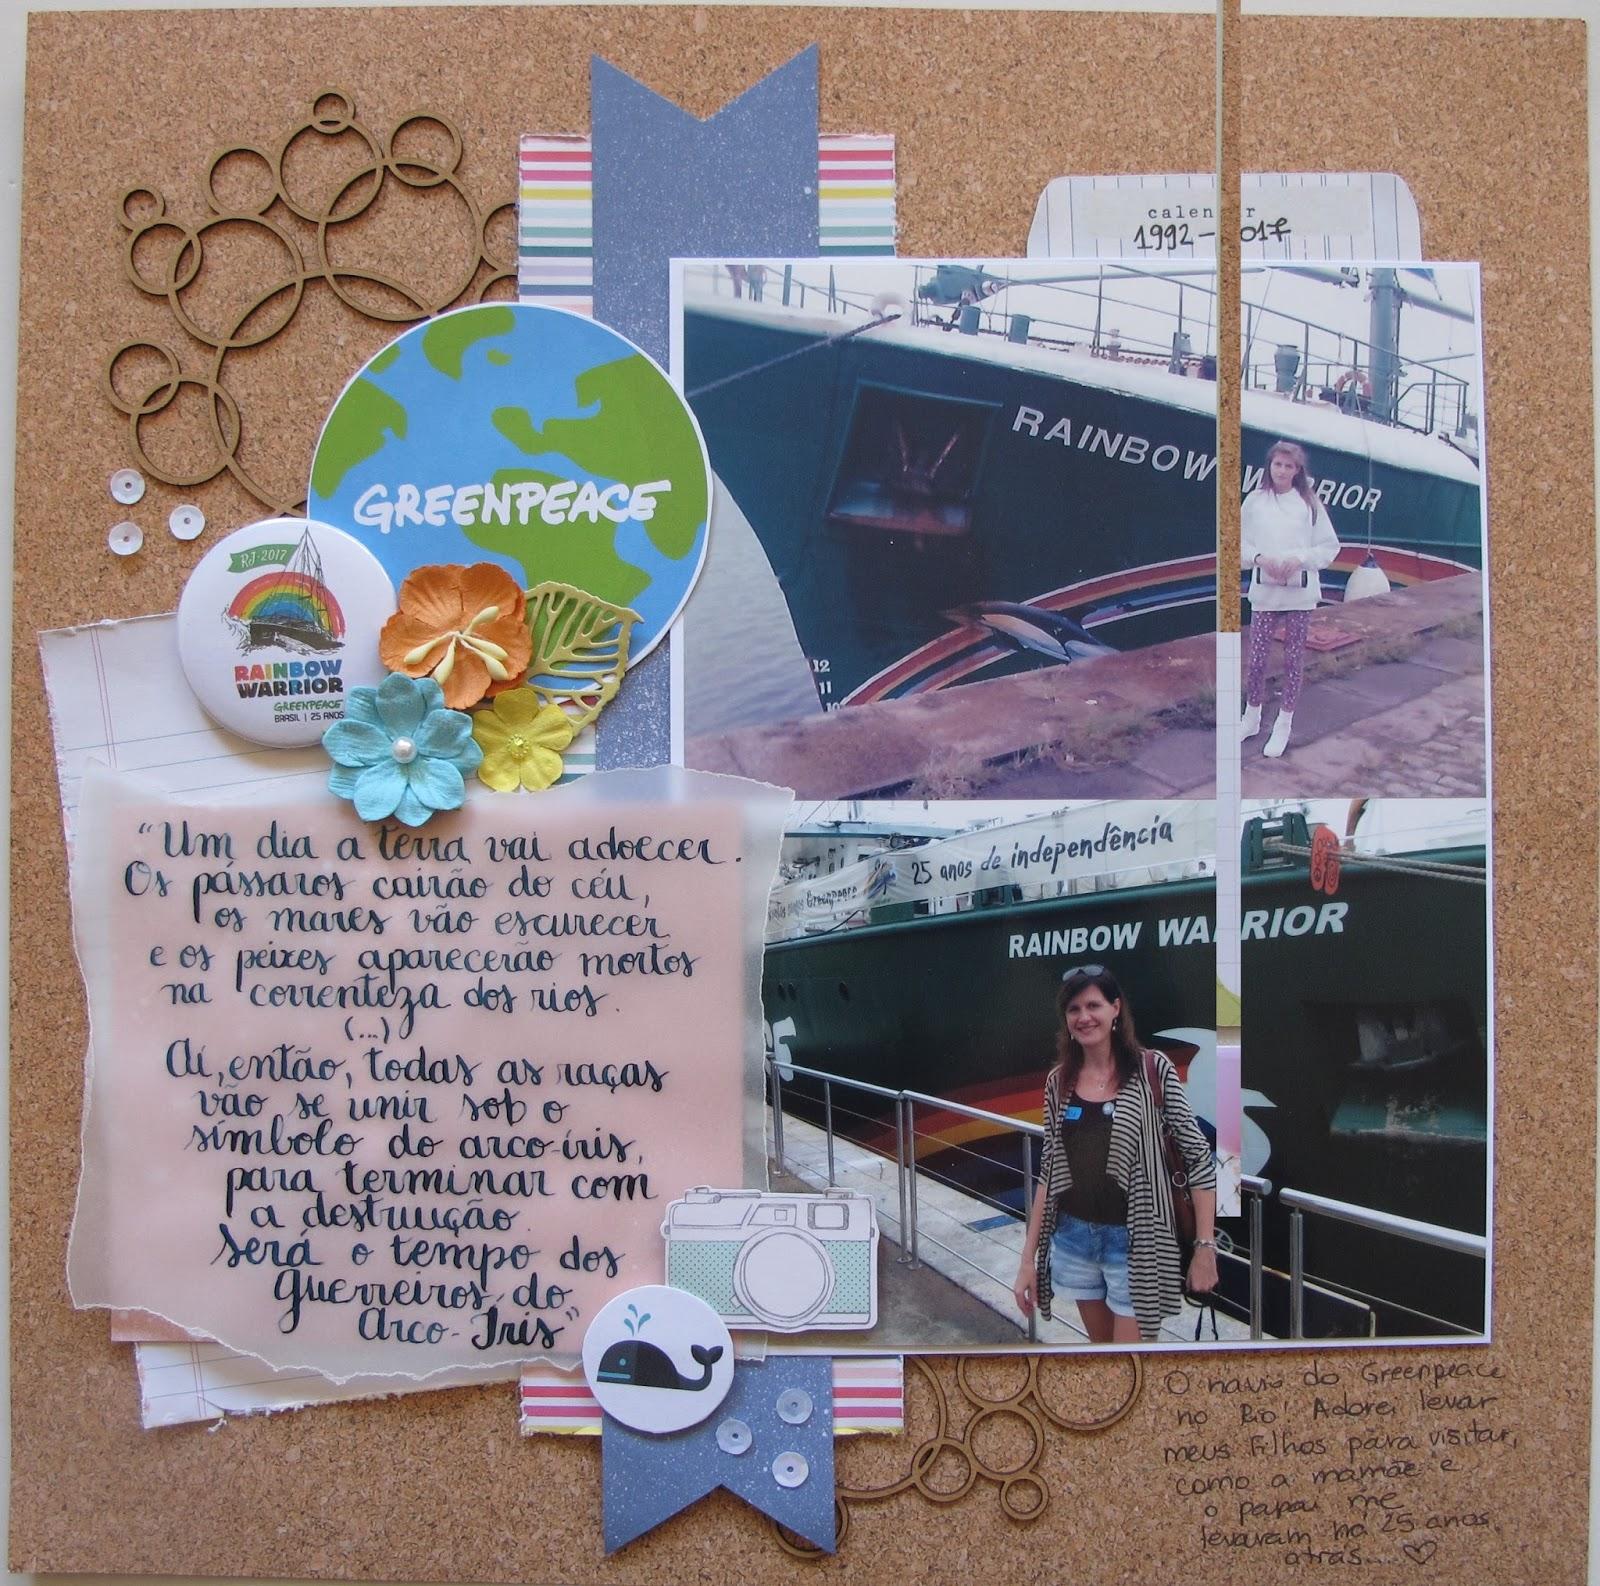 Rainbow Warrior I Ii Y Iii Greenpeace: Scrapbooking By Débora Prass